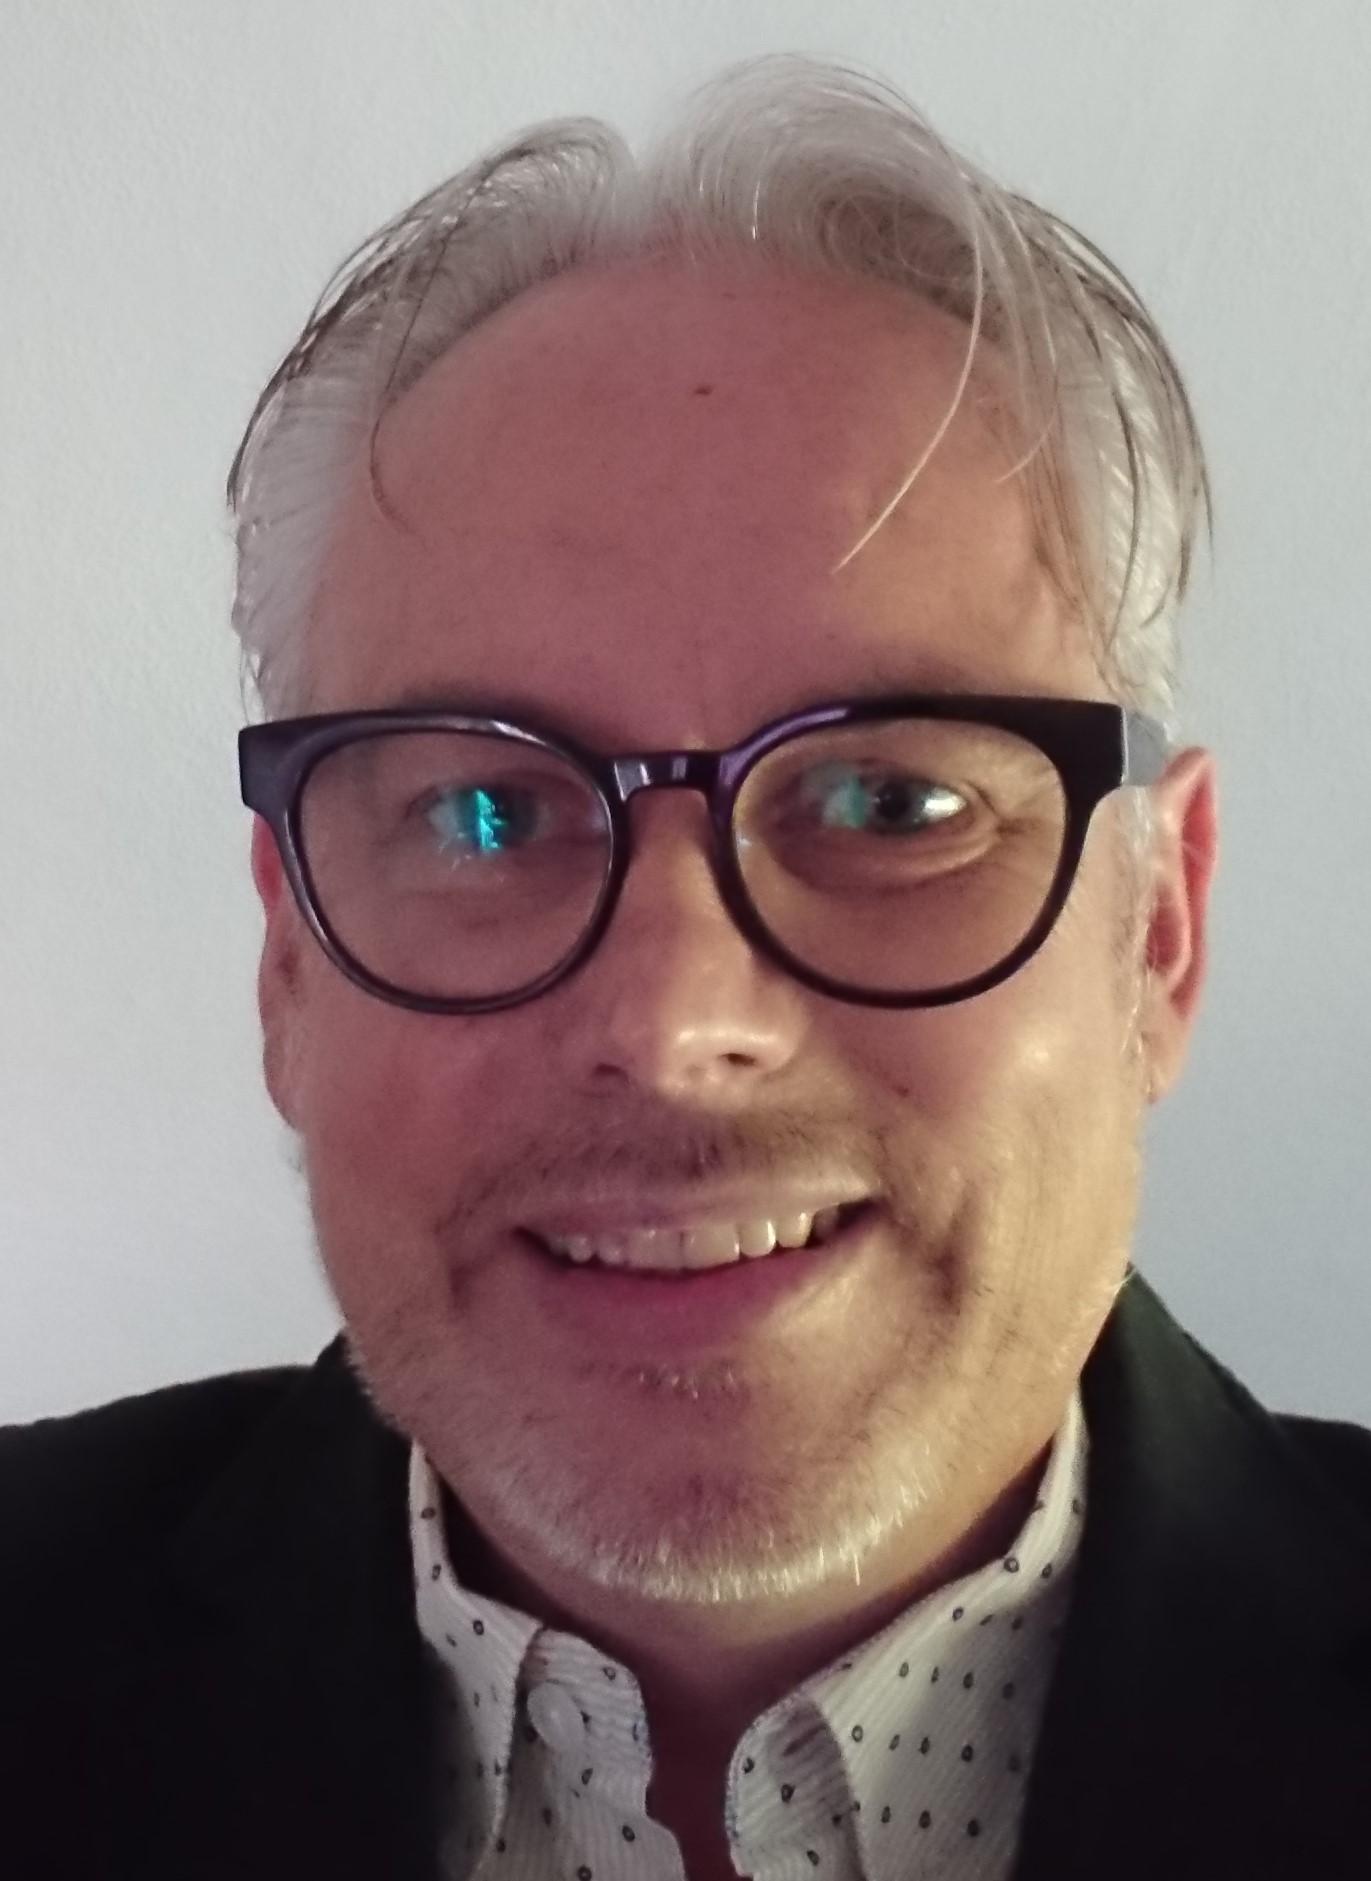 Bengt Persson Distriktsguvernör 2019-2020